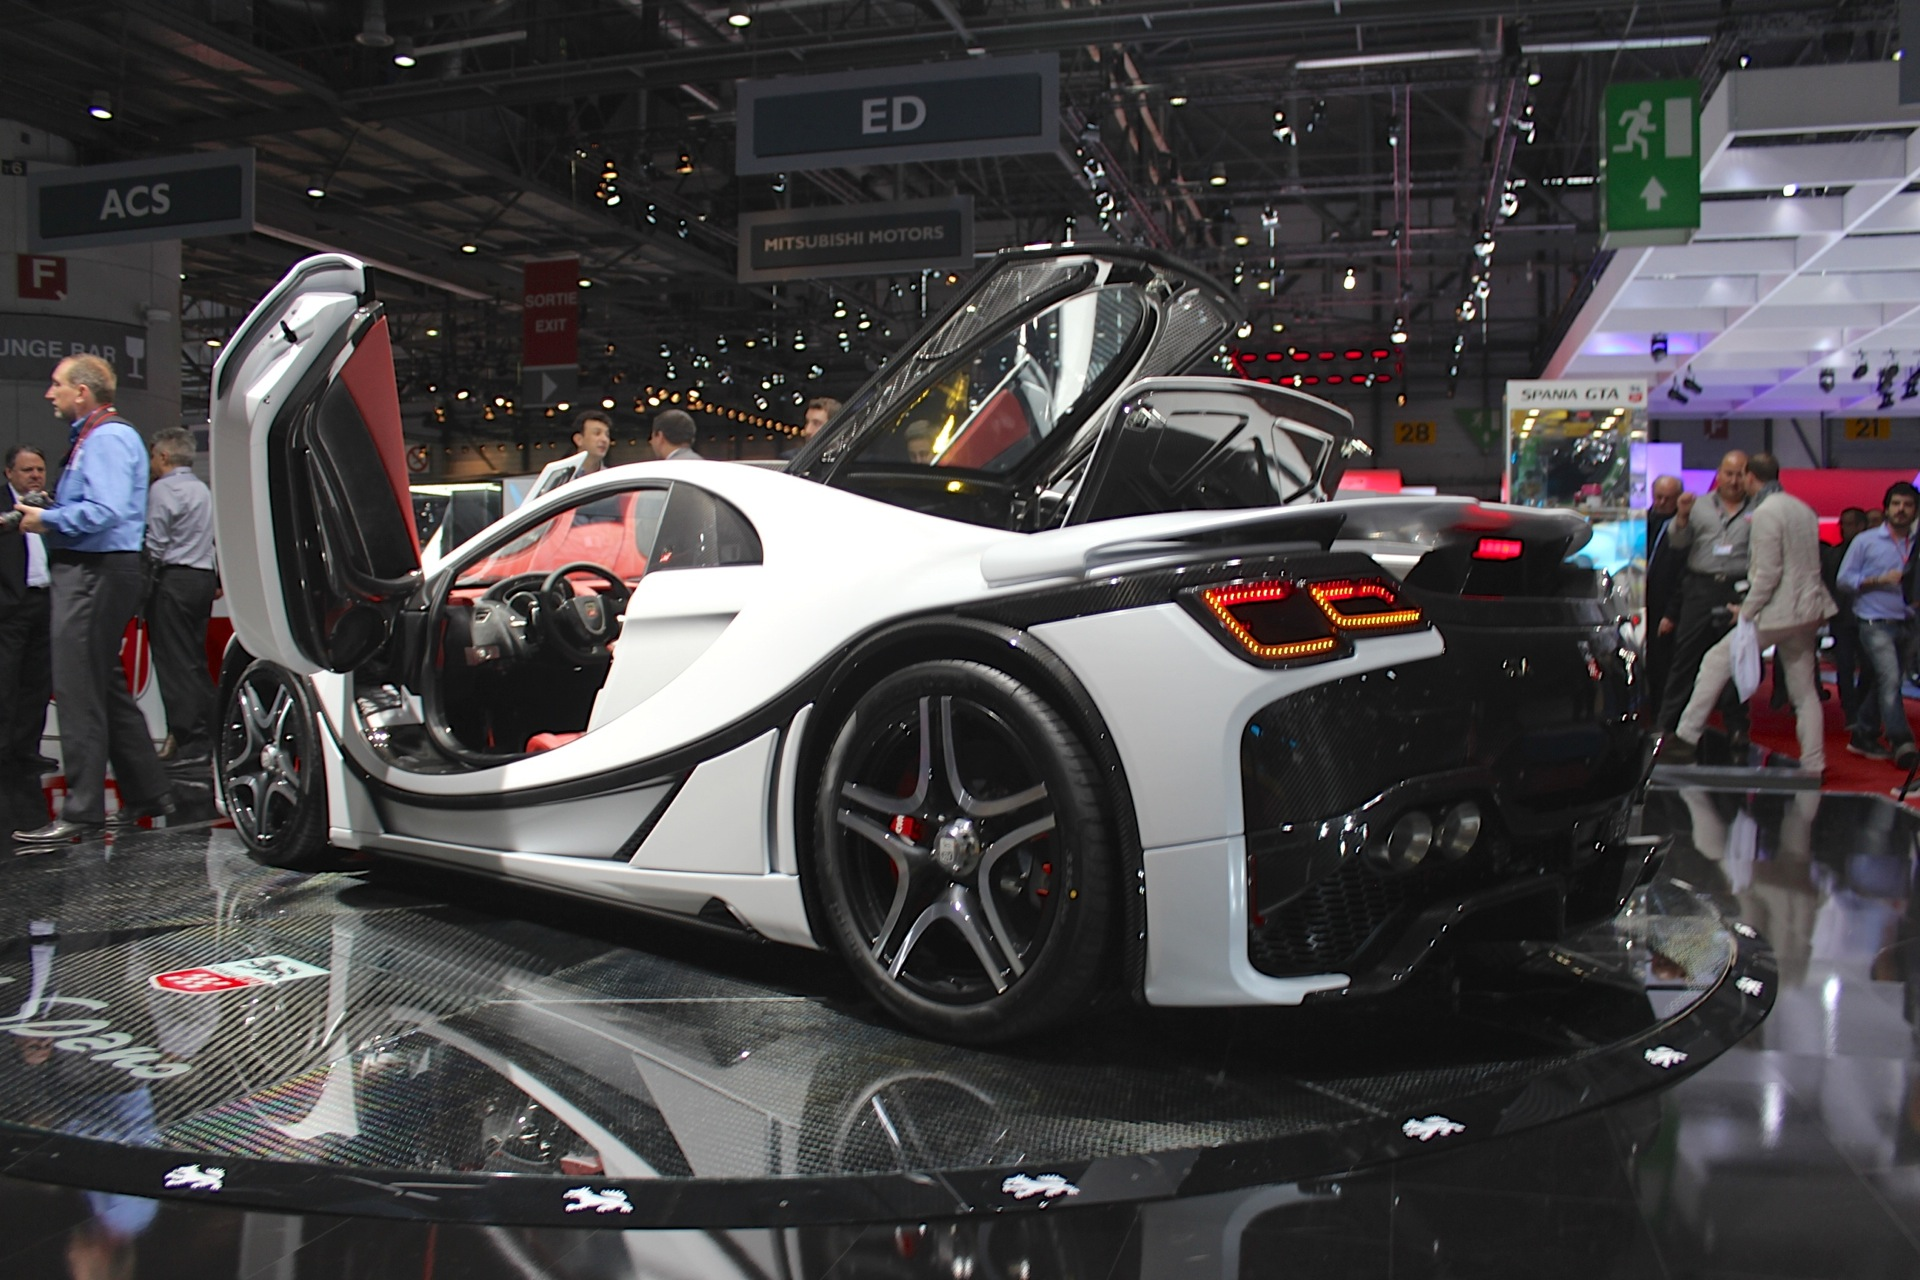 Spain's GTA reveals new version of Spano V-10 supercar at ...